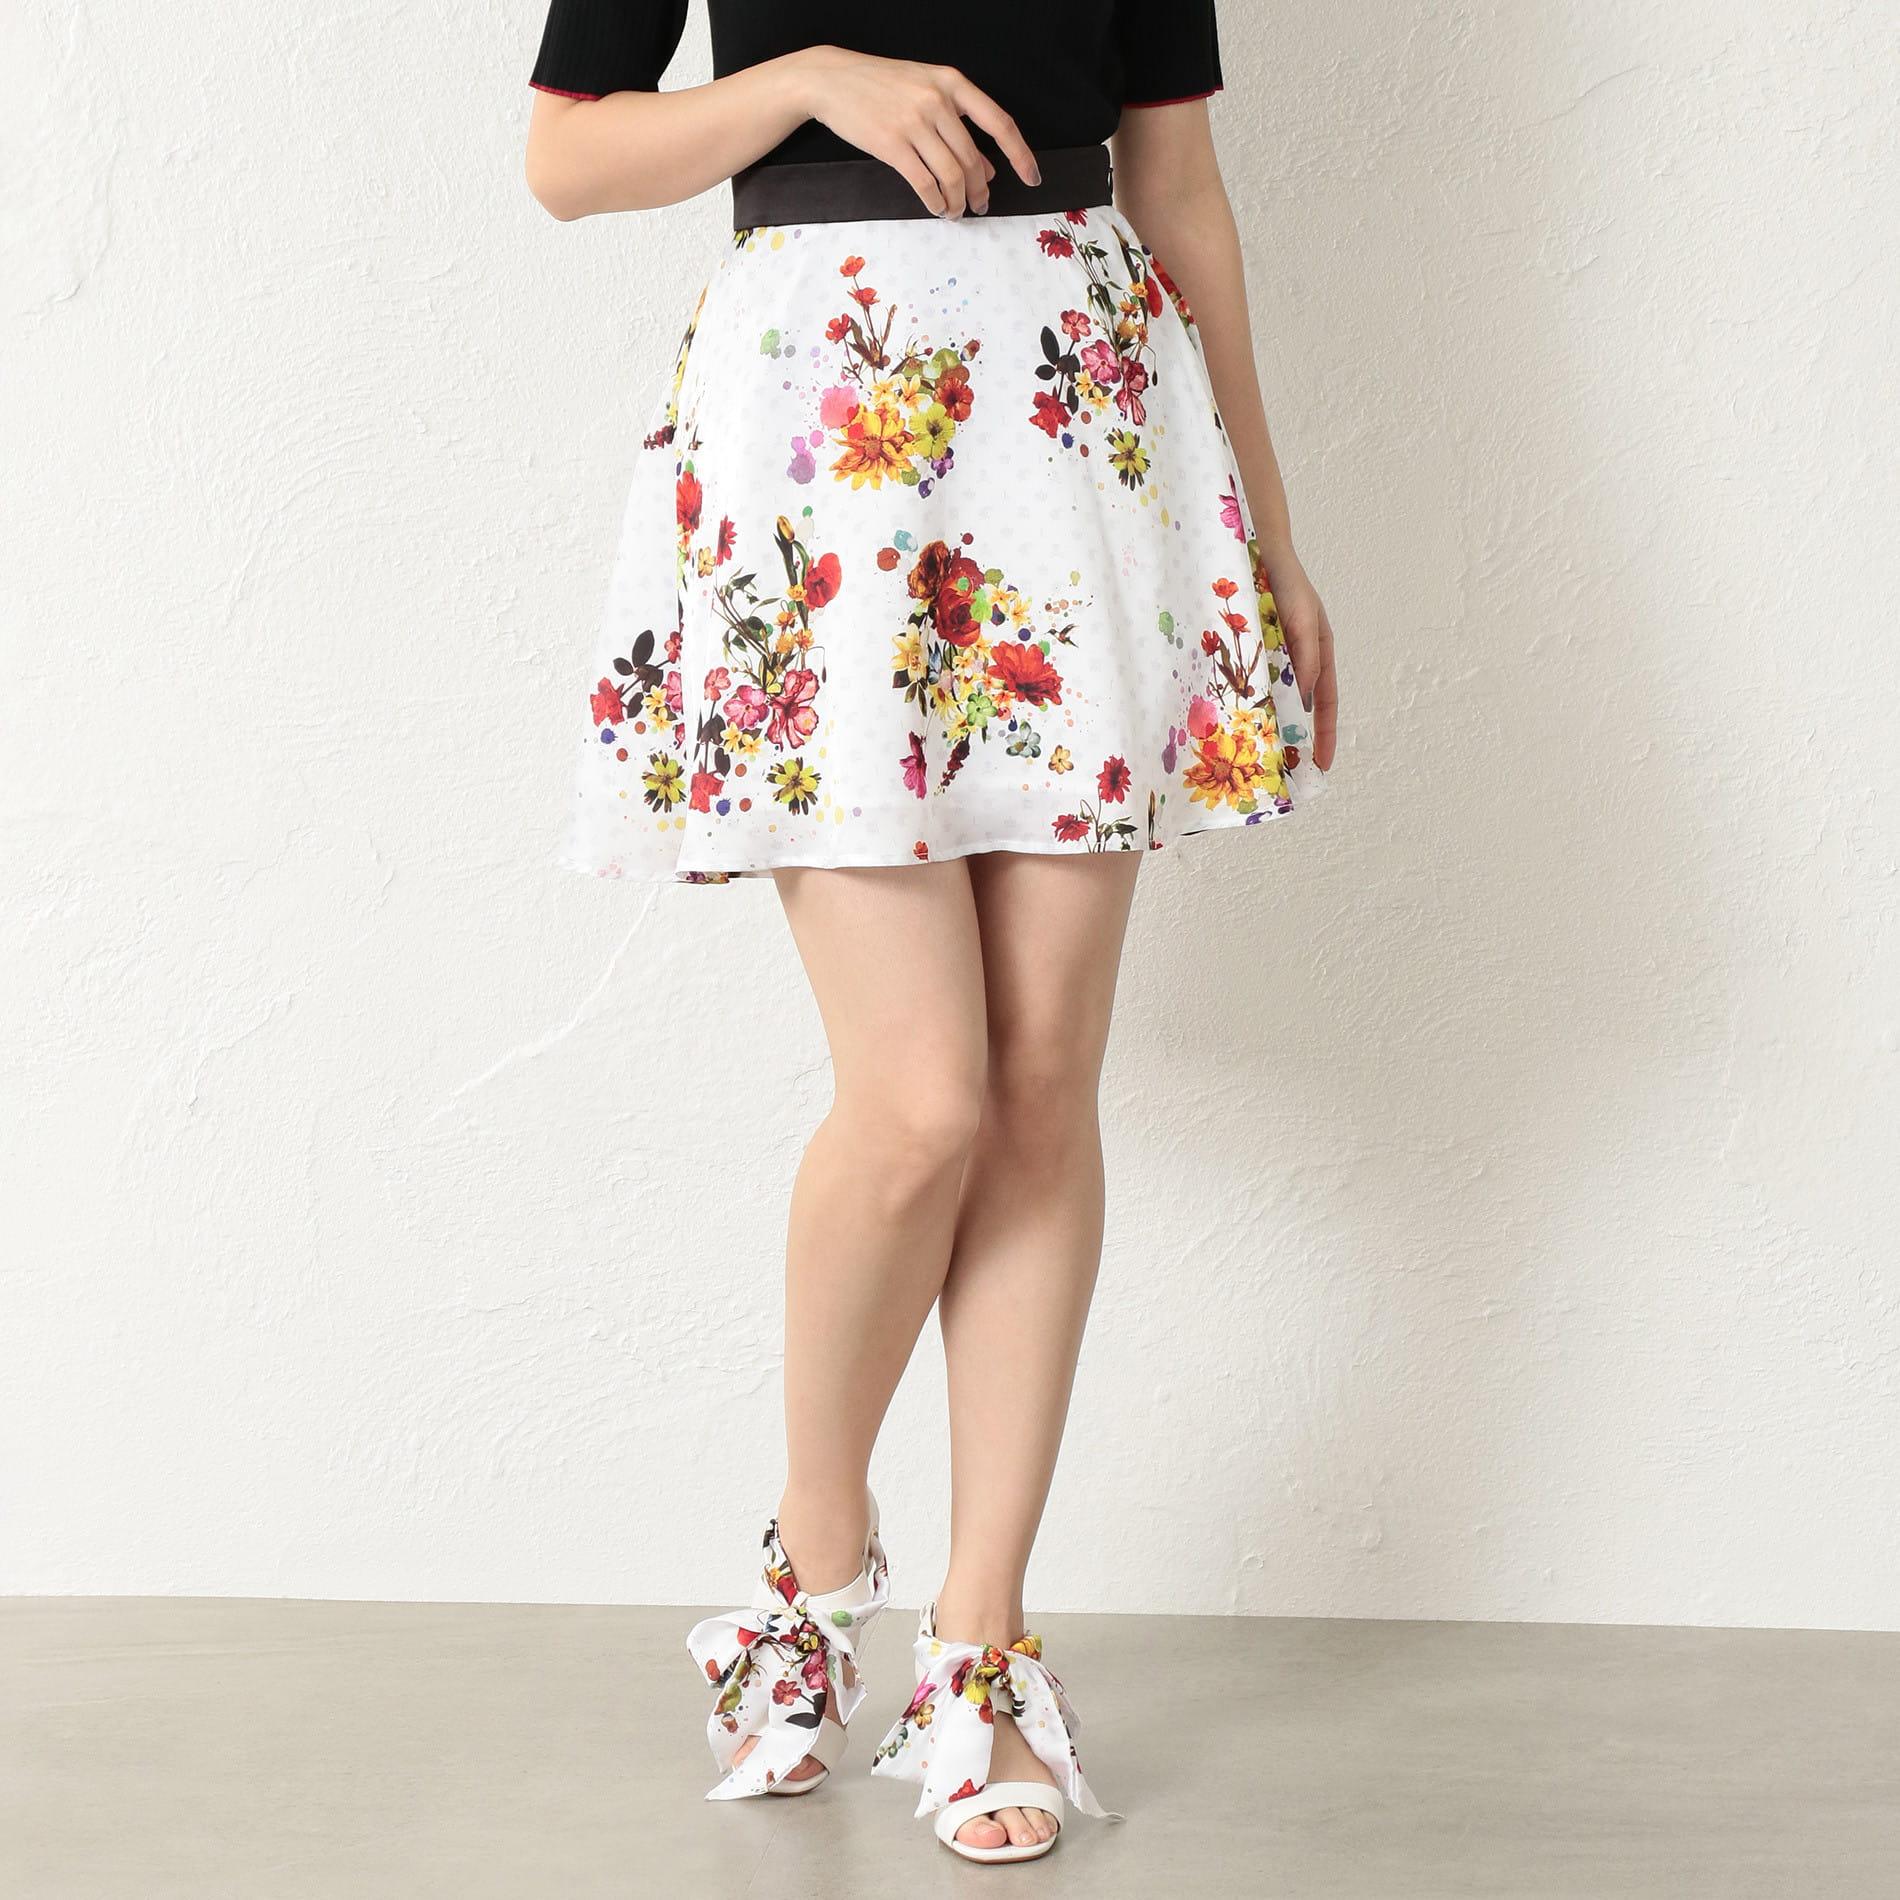 WOMEN nowarttモノグラムフレアスカート